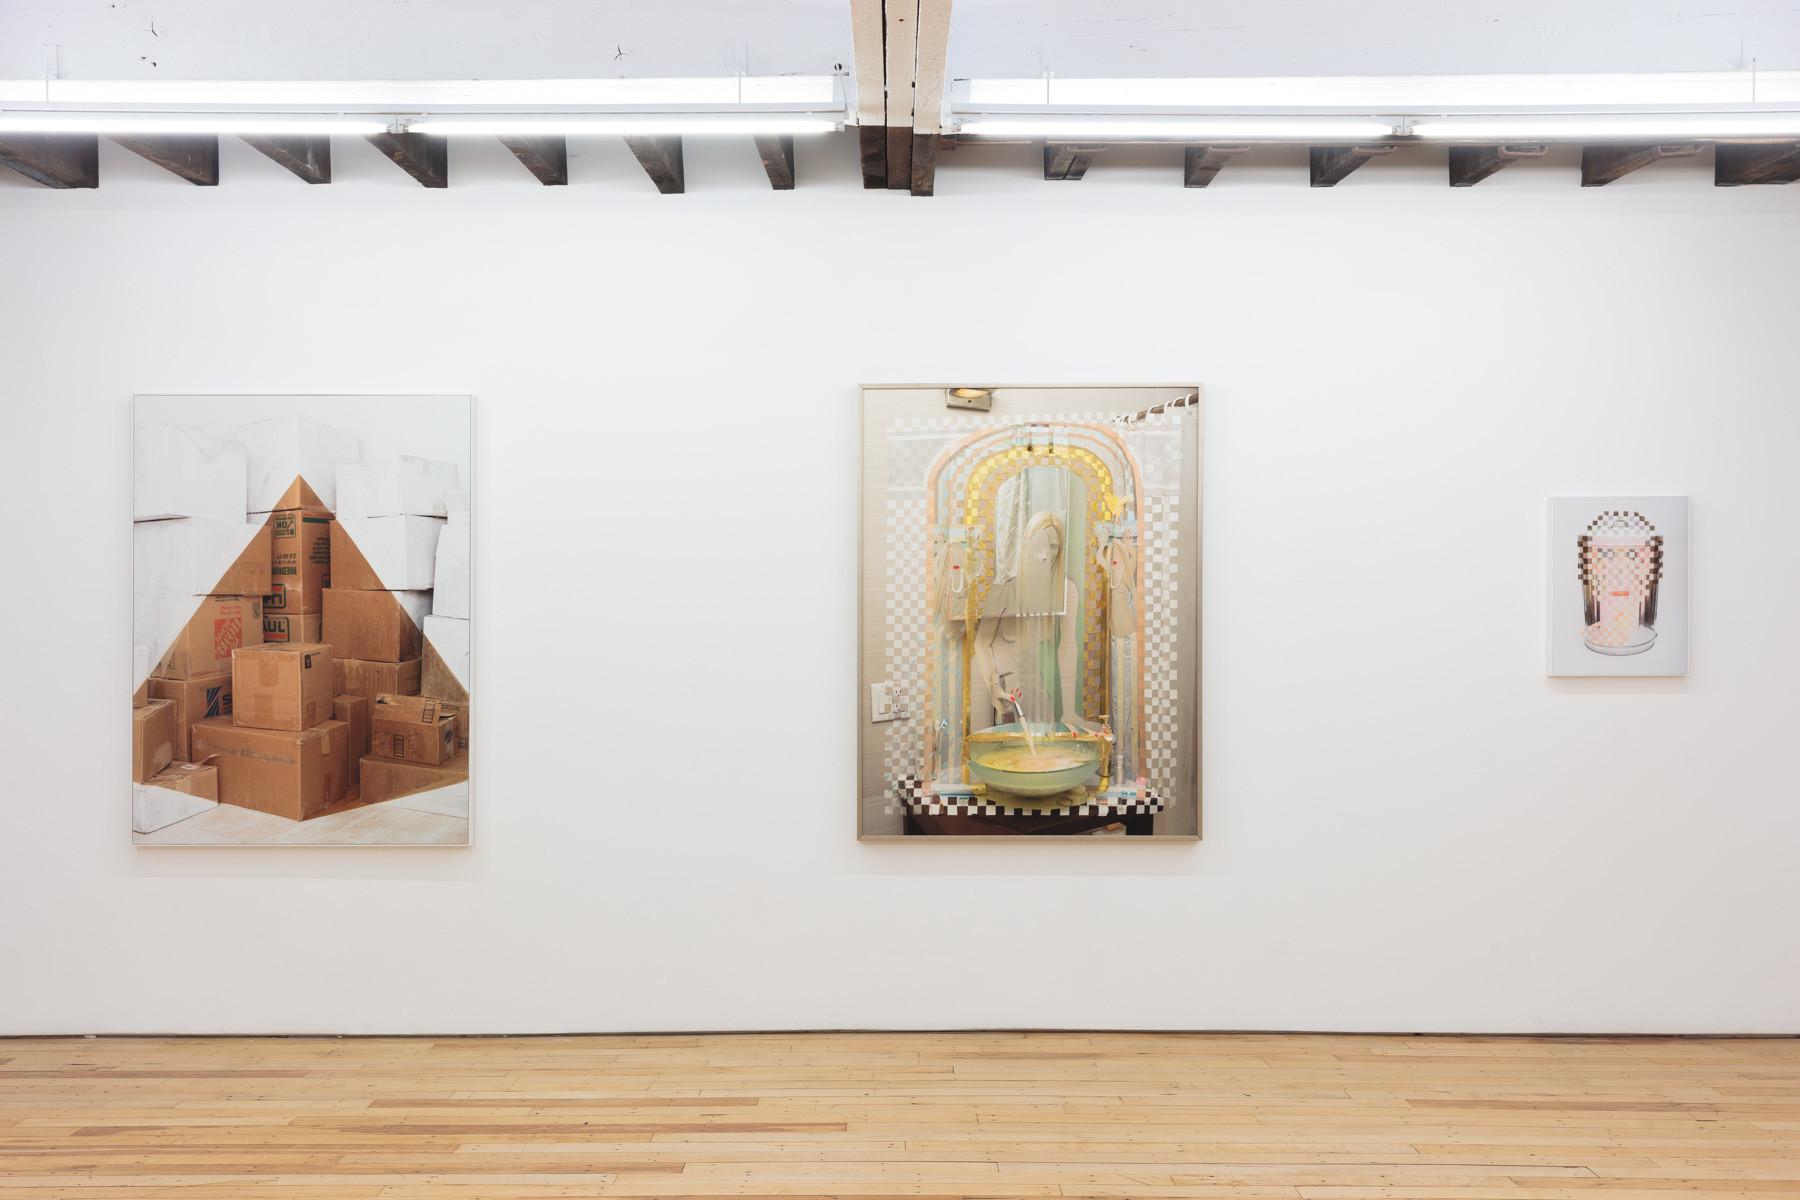 Installation view, House Hunting, Rachel Uffner, 2019